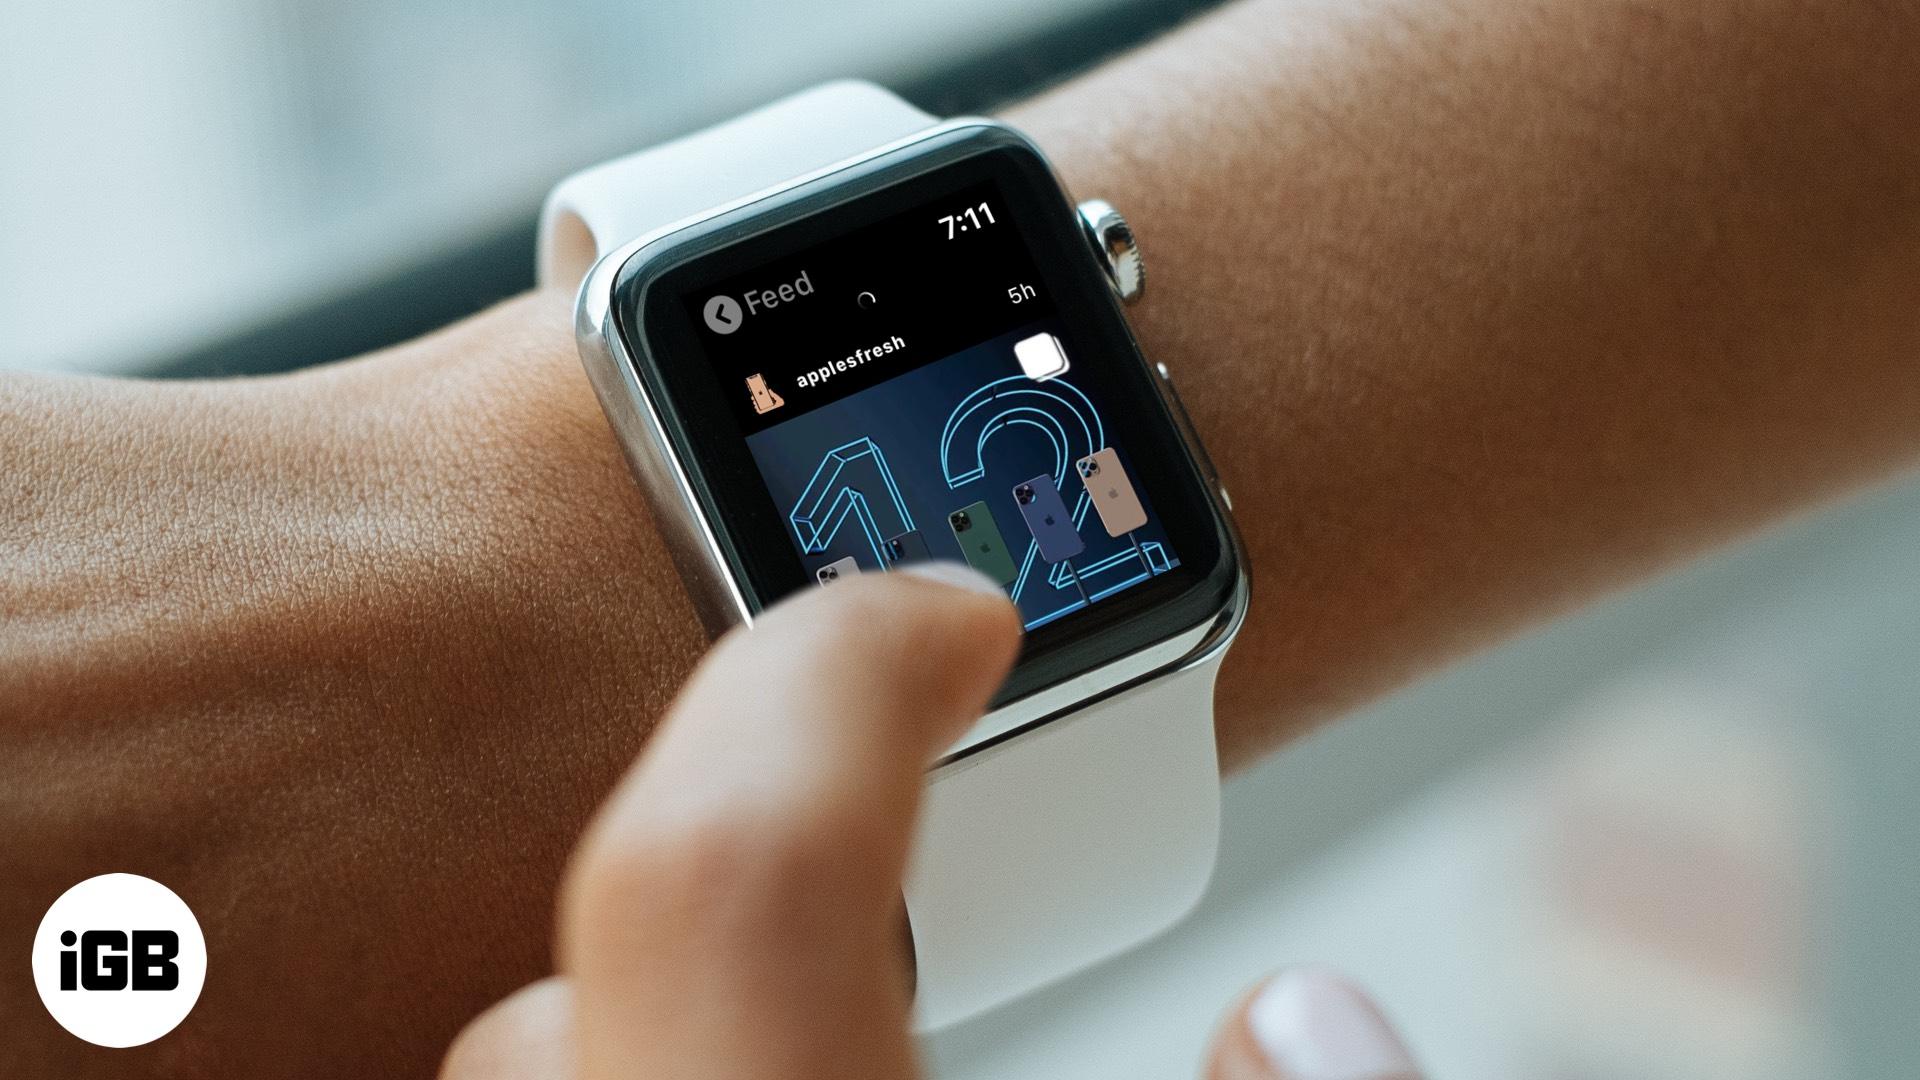 Bagaimana untuk mendapatkan Instagram pada mana-mana Apple Watch